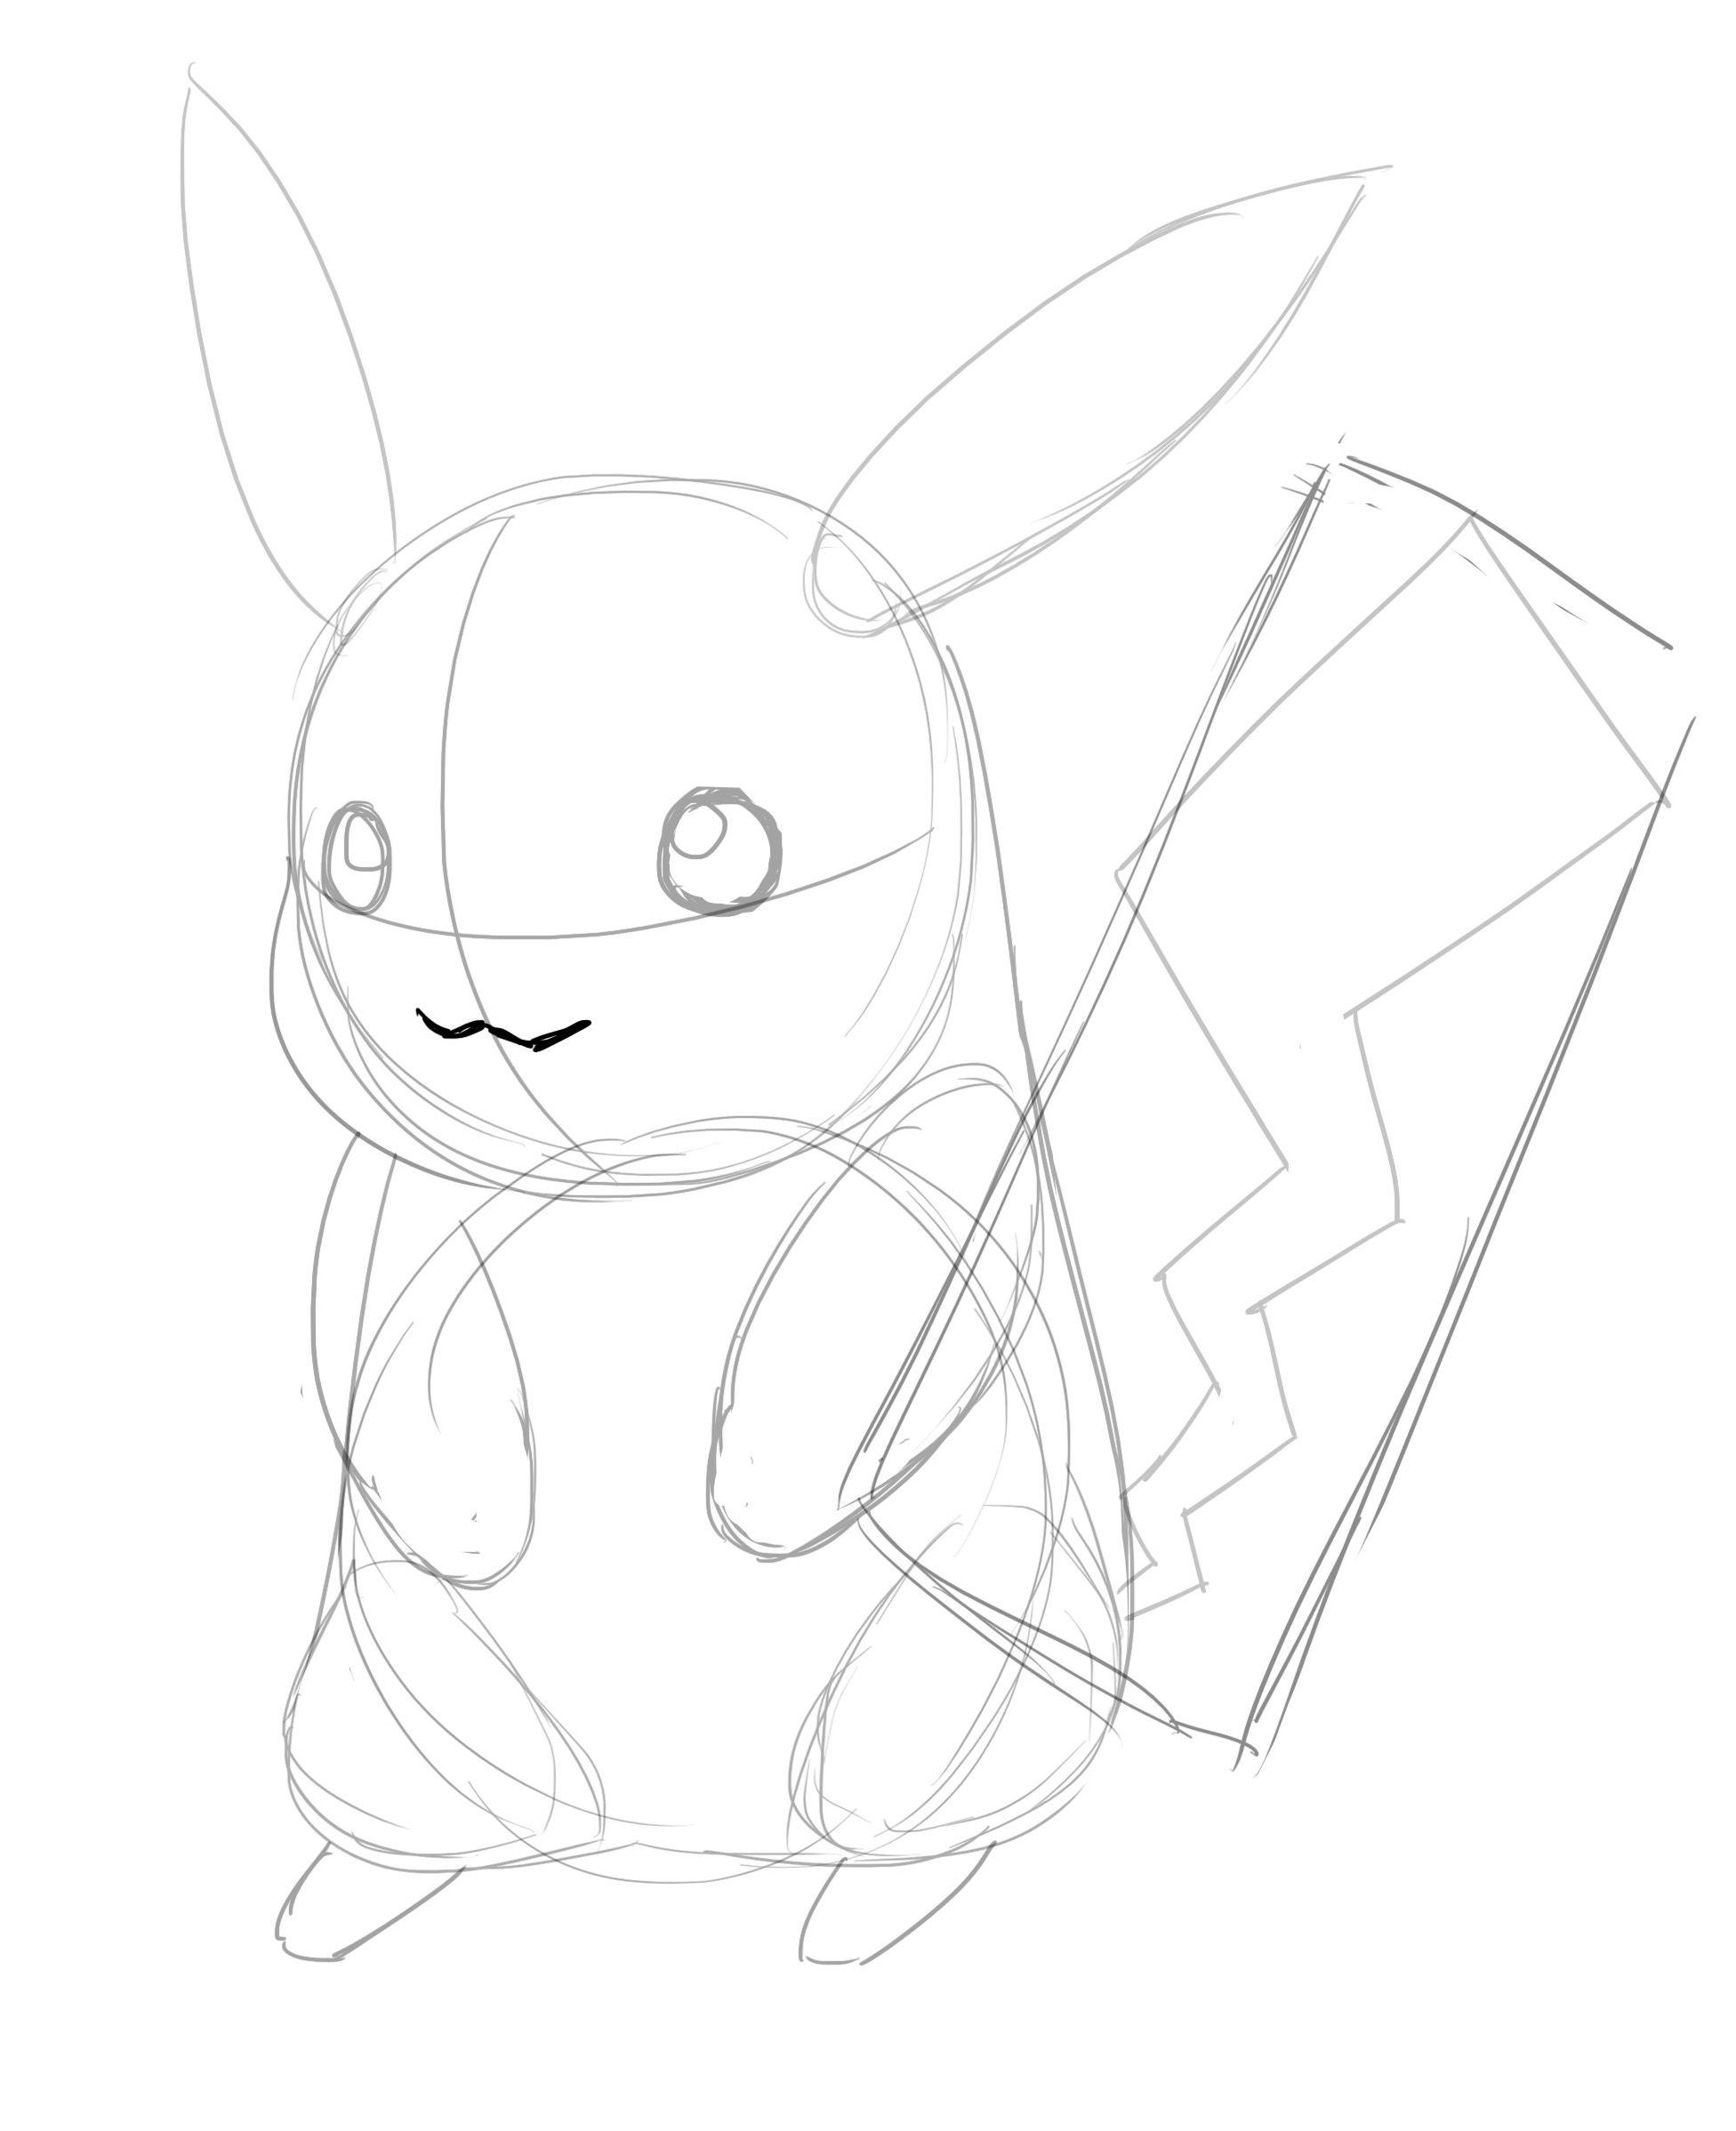 Comment Dessiner Pikachu Dessin Pikachu Comment Dessiner Pikachu Pikachu